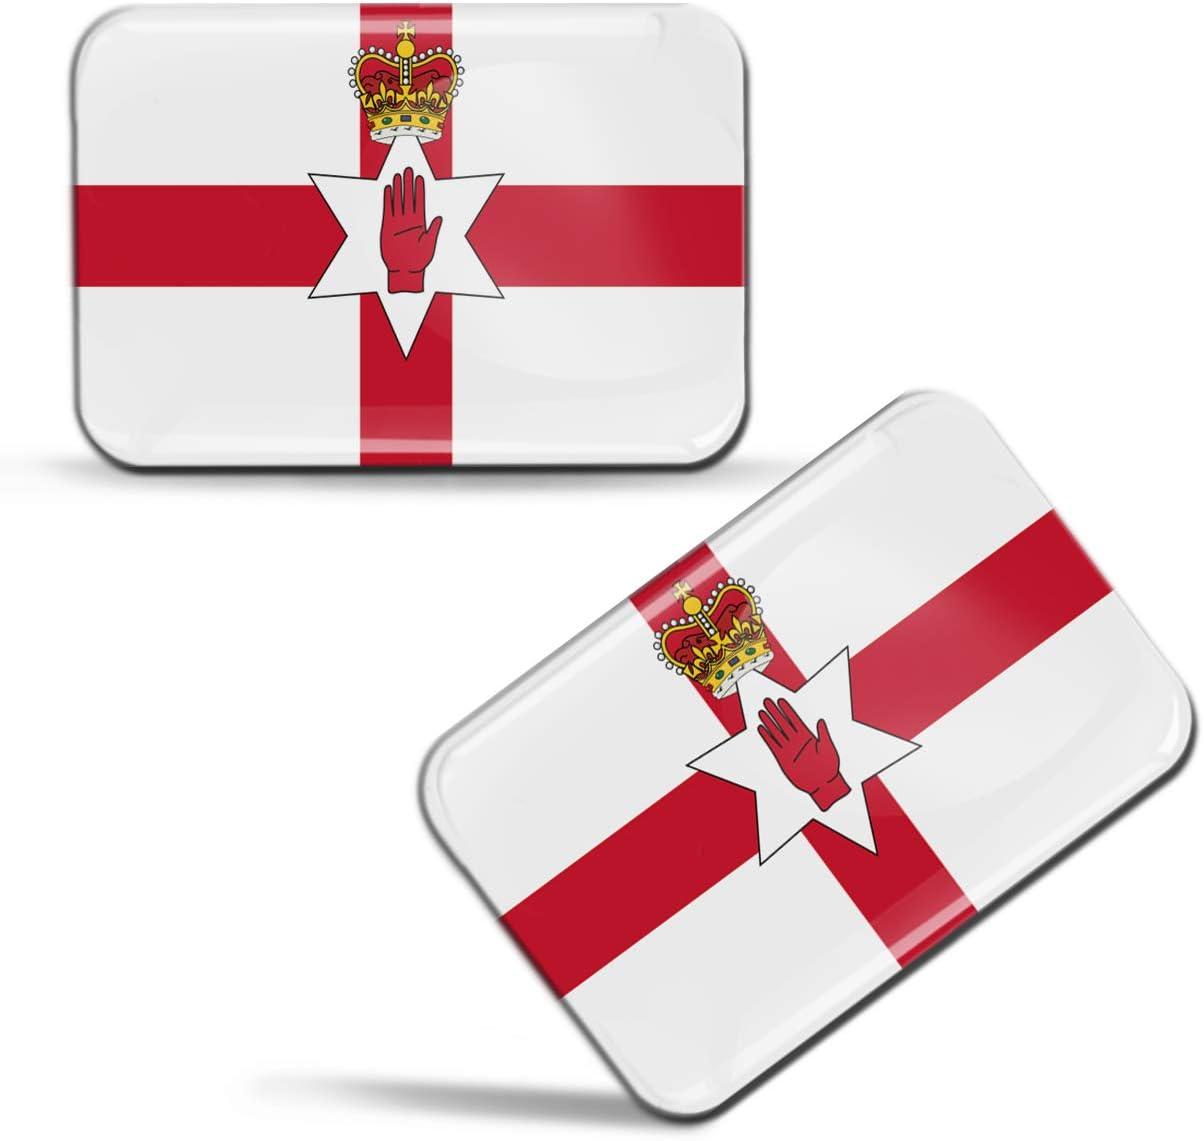 Biomar Labs 2 X Aufkleber 3d Gel Silikon Stickers Nordirland Nordirische Flagge Hand Der Ulster Rot Fahne Northern Ireland Irish Flag Auto Motorrad Fahrrad Fenster Tür Pc Tablet Laptop F 77 Amazon De